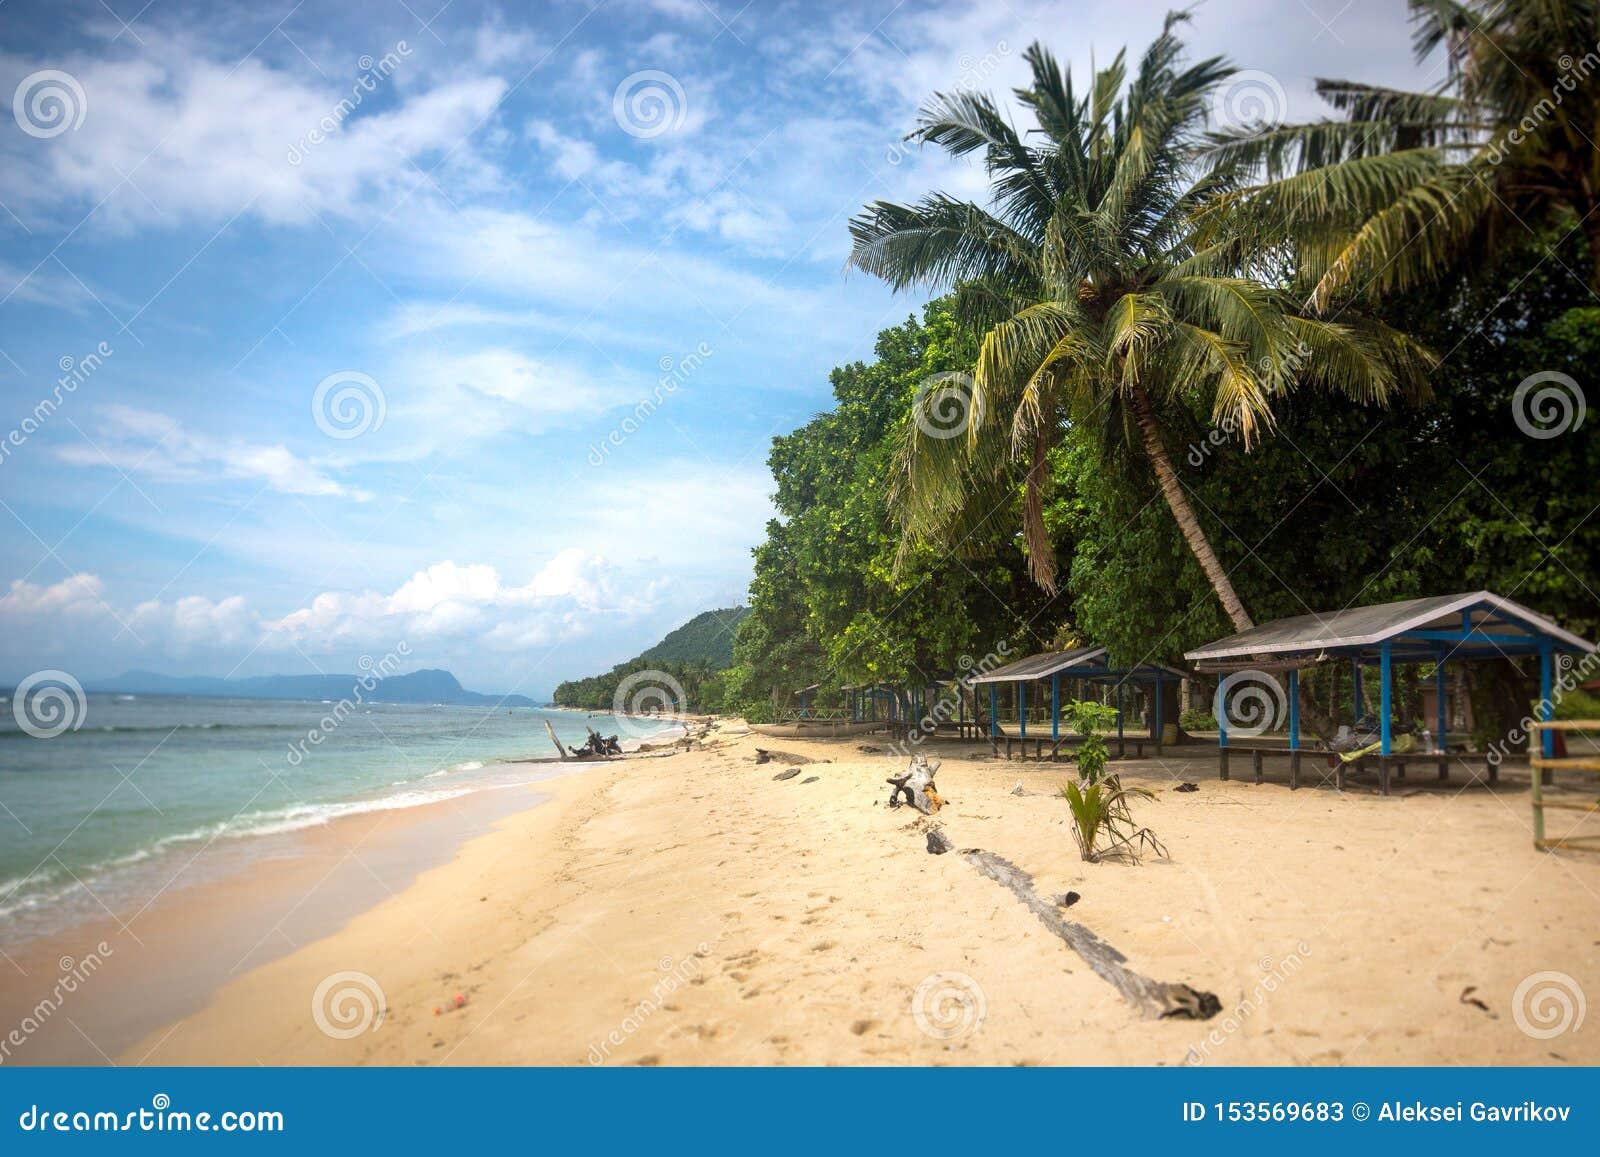 Stranden i Papua Nya Guinea